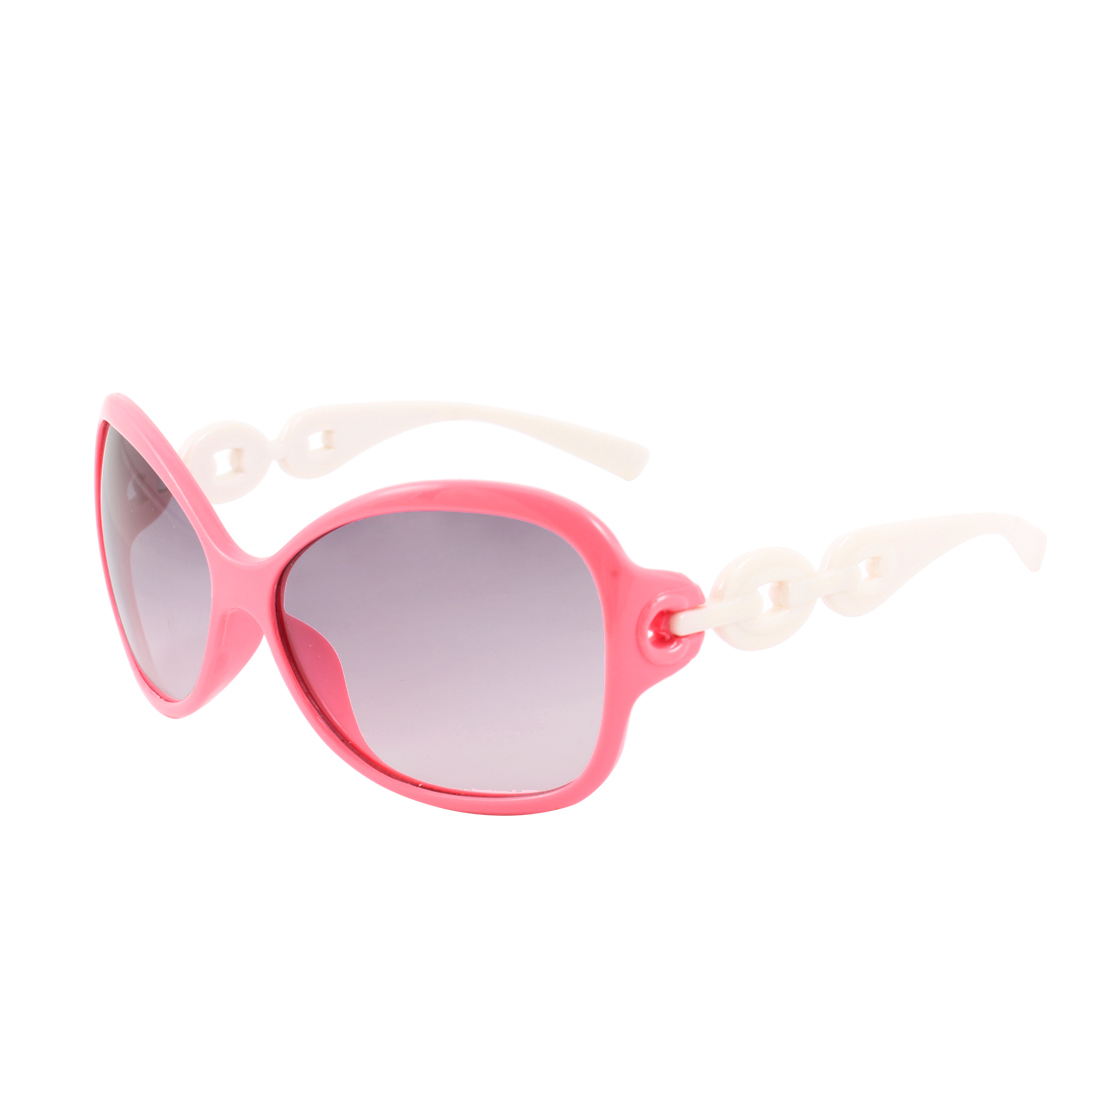 Children White Plastic Arms Full Frame Single Bridge Sunglasses